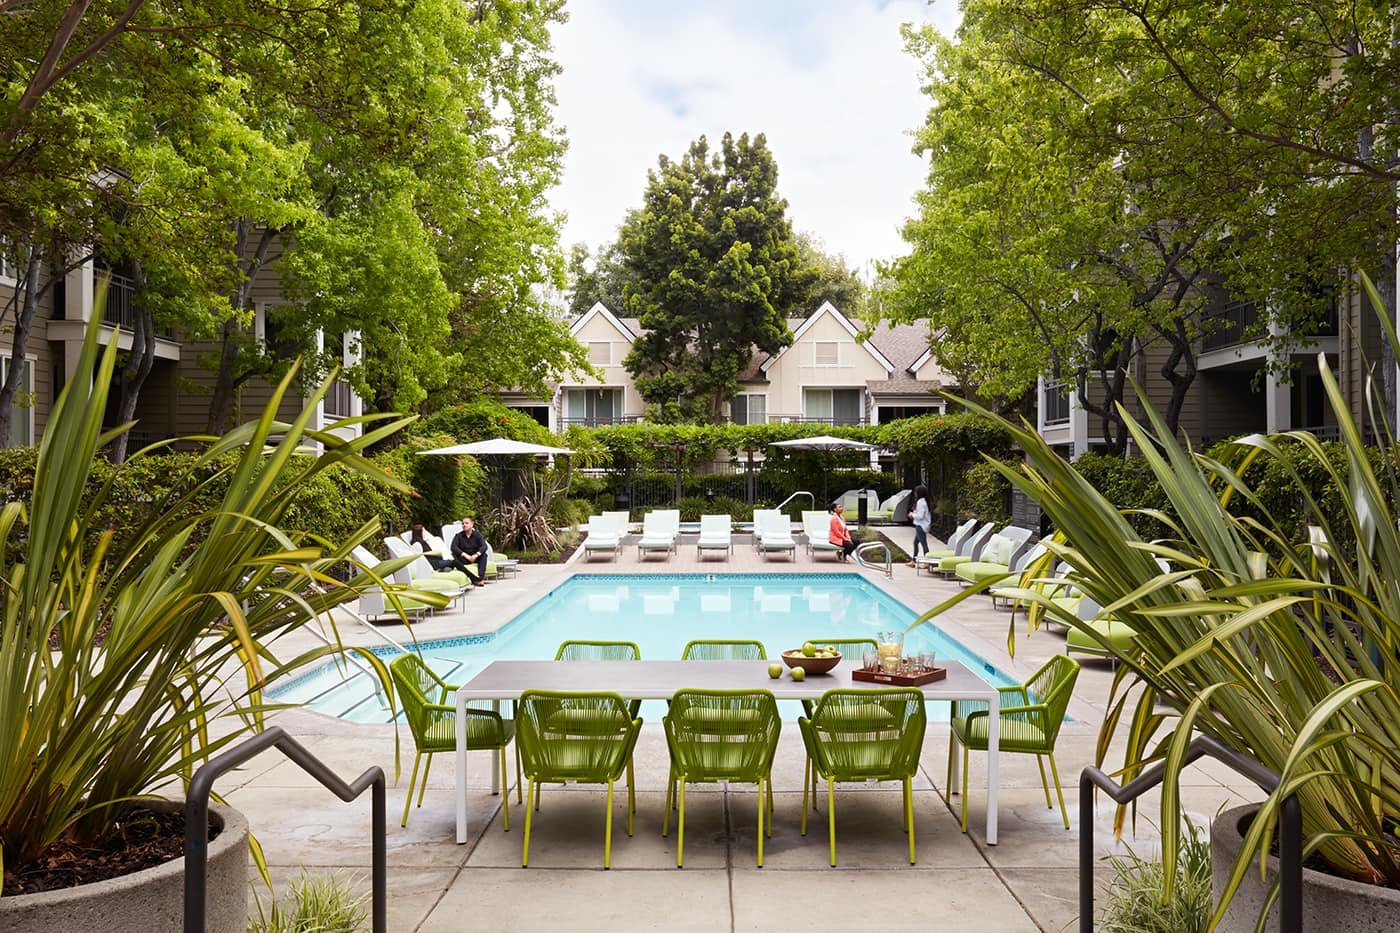 Park Central Apartments apartments in Santa Clara CA to rent photo 2